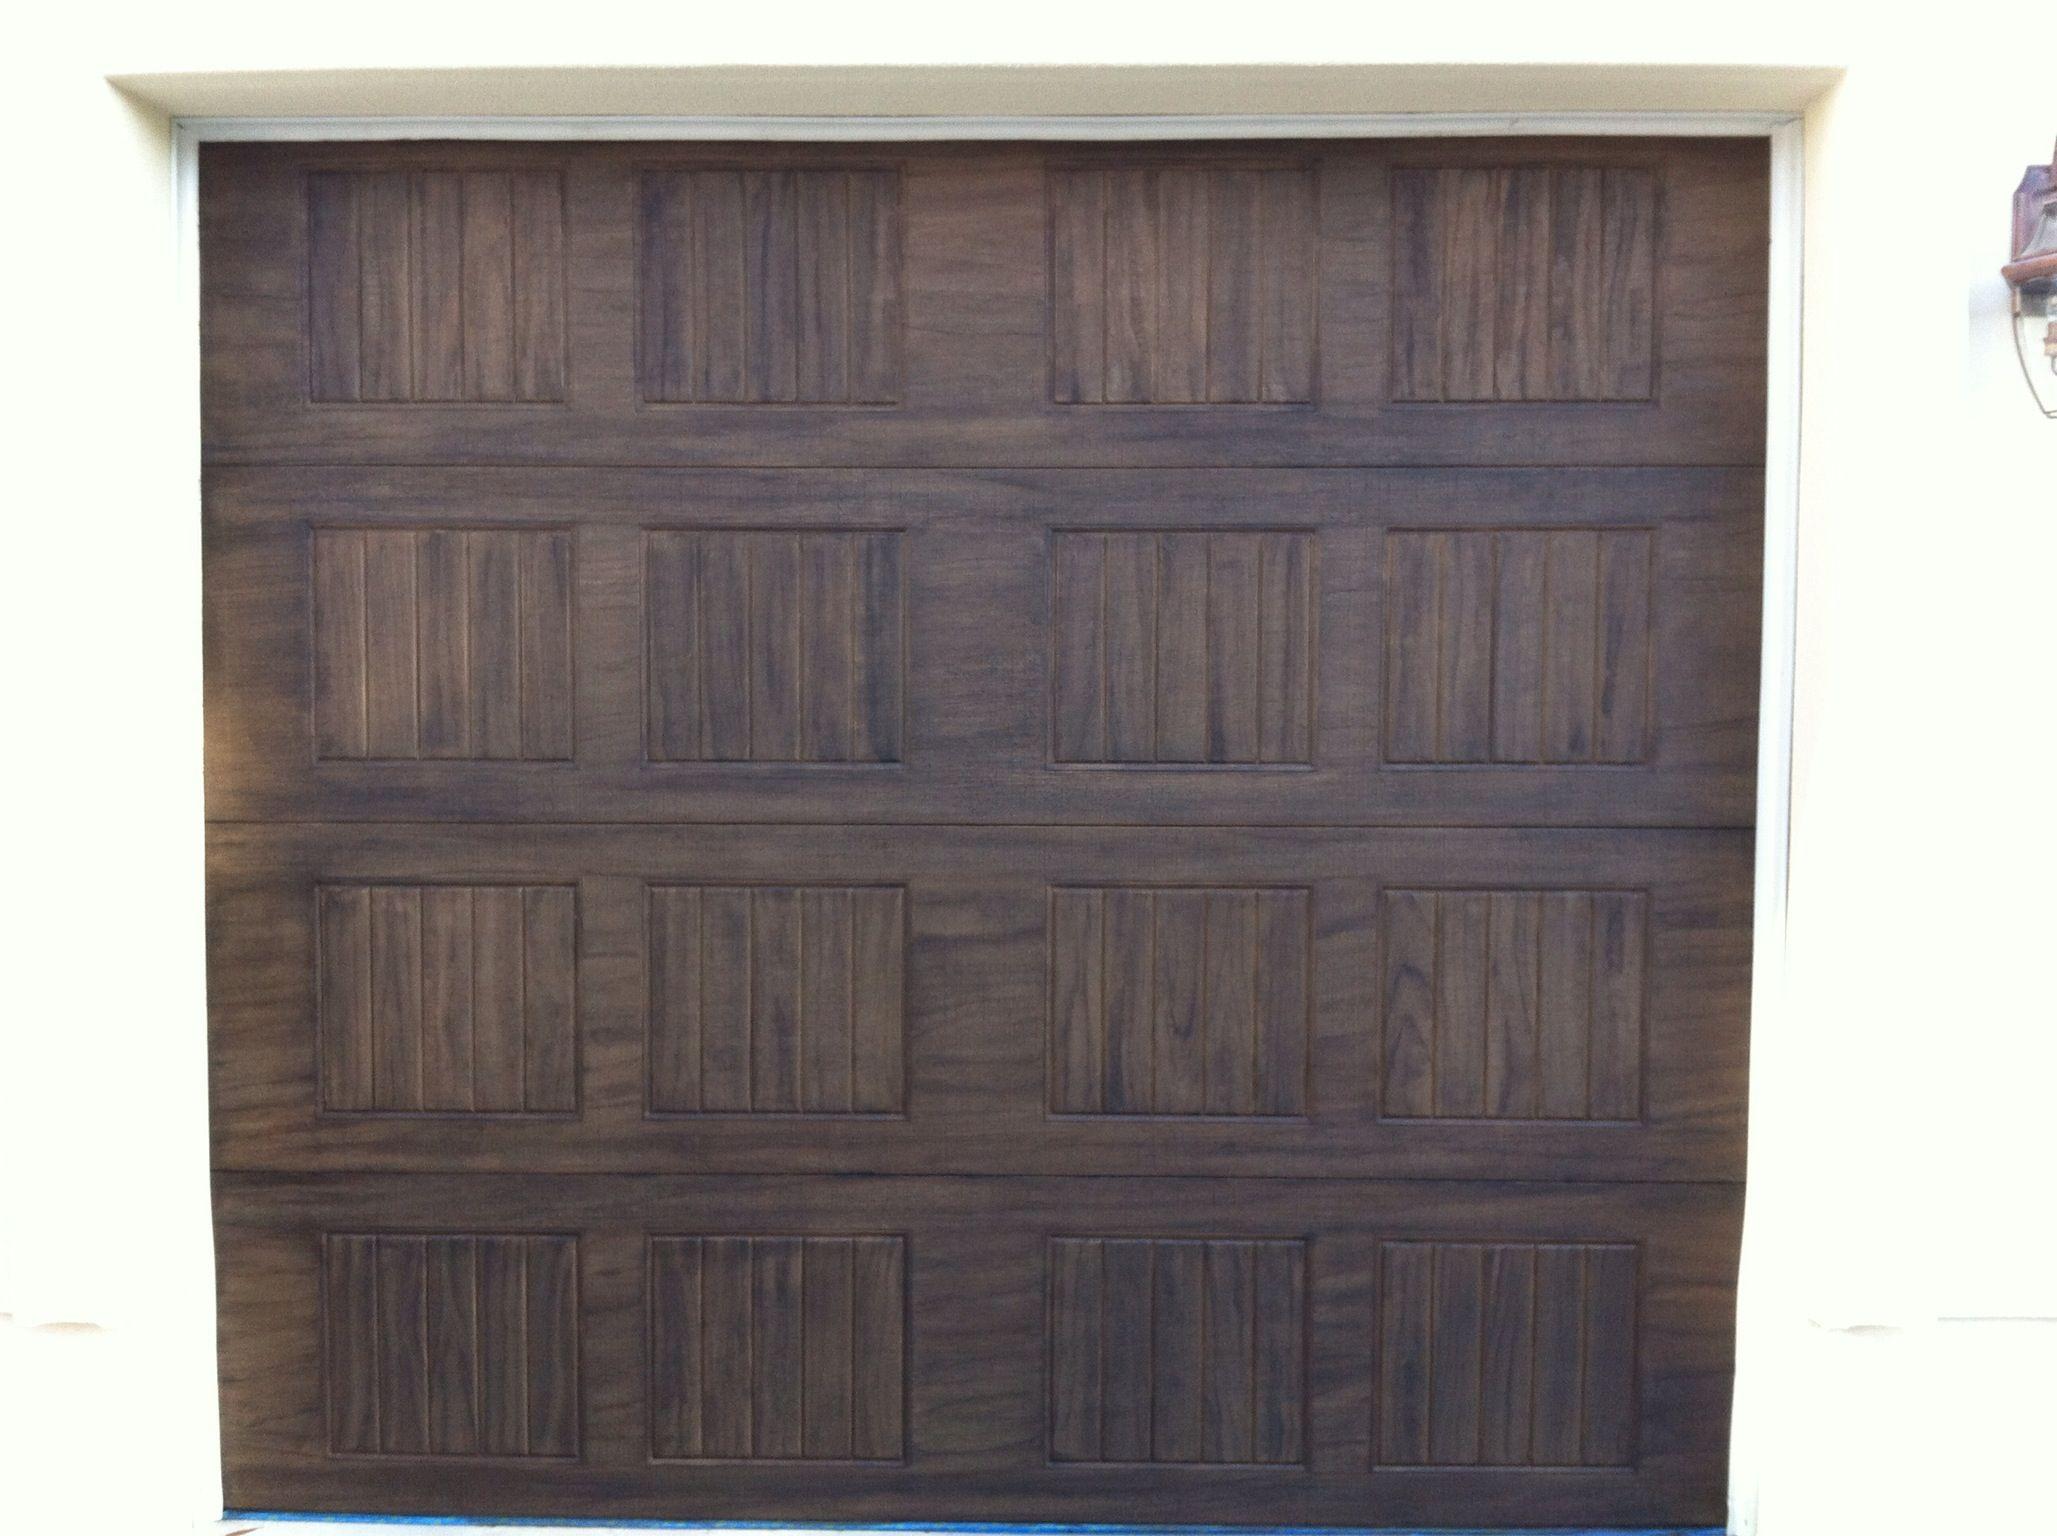 Aluminum garage doors painted to look like stained wood custom aluminum garage doors painted to look like stained wood rubansaba